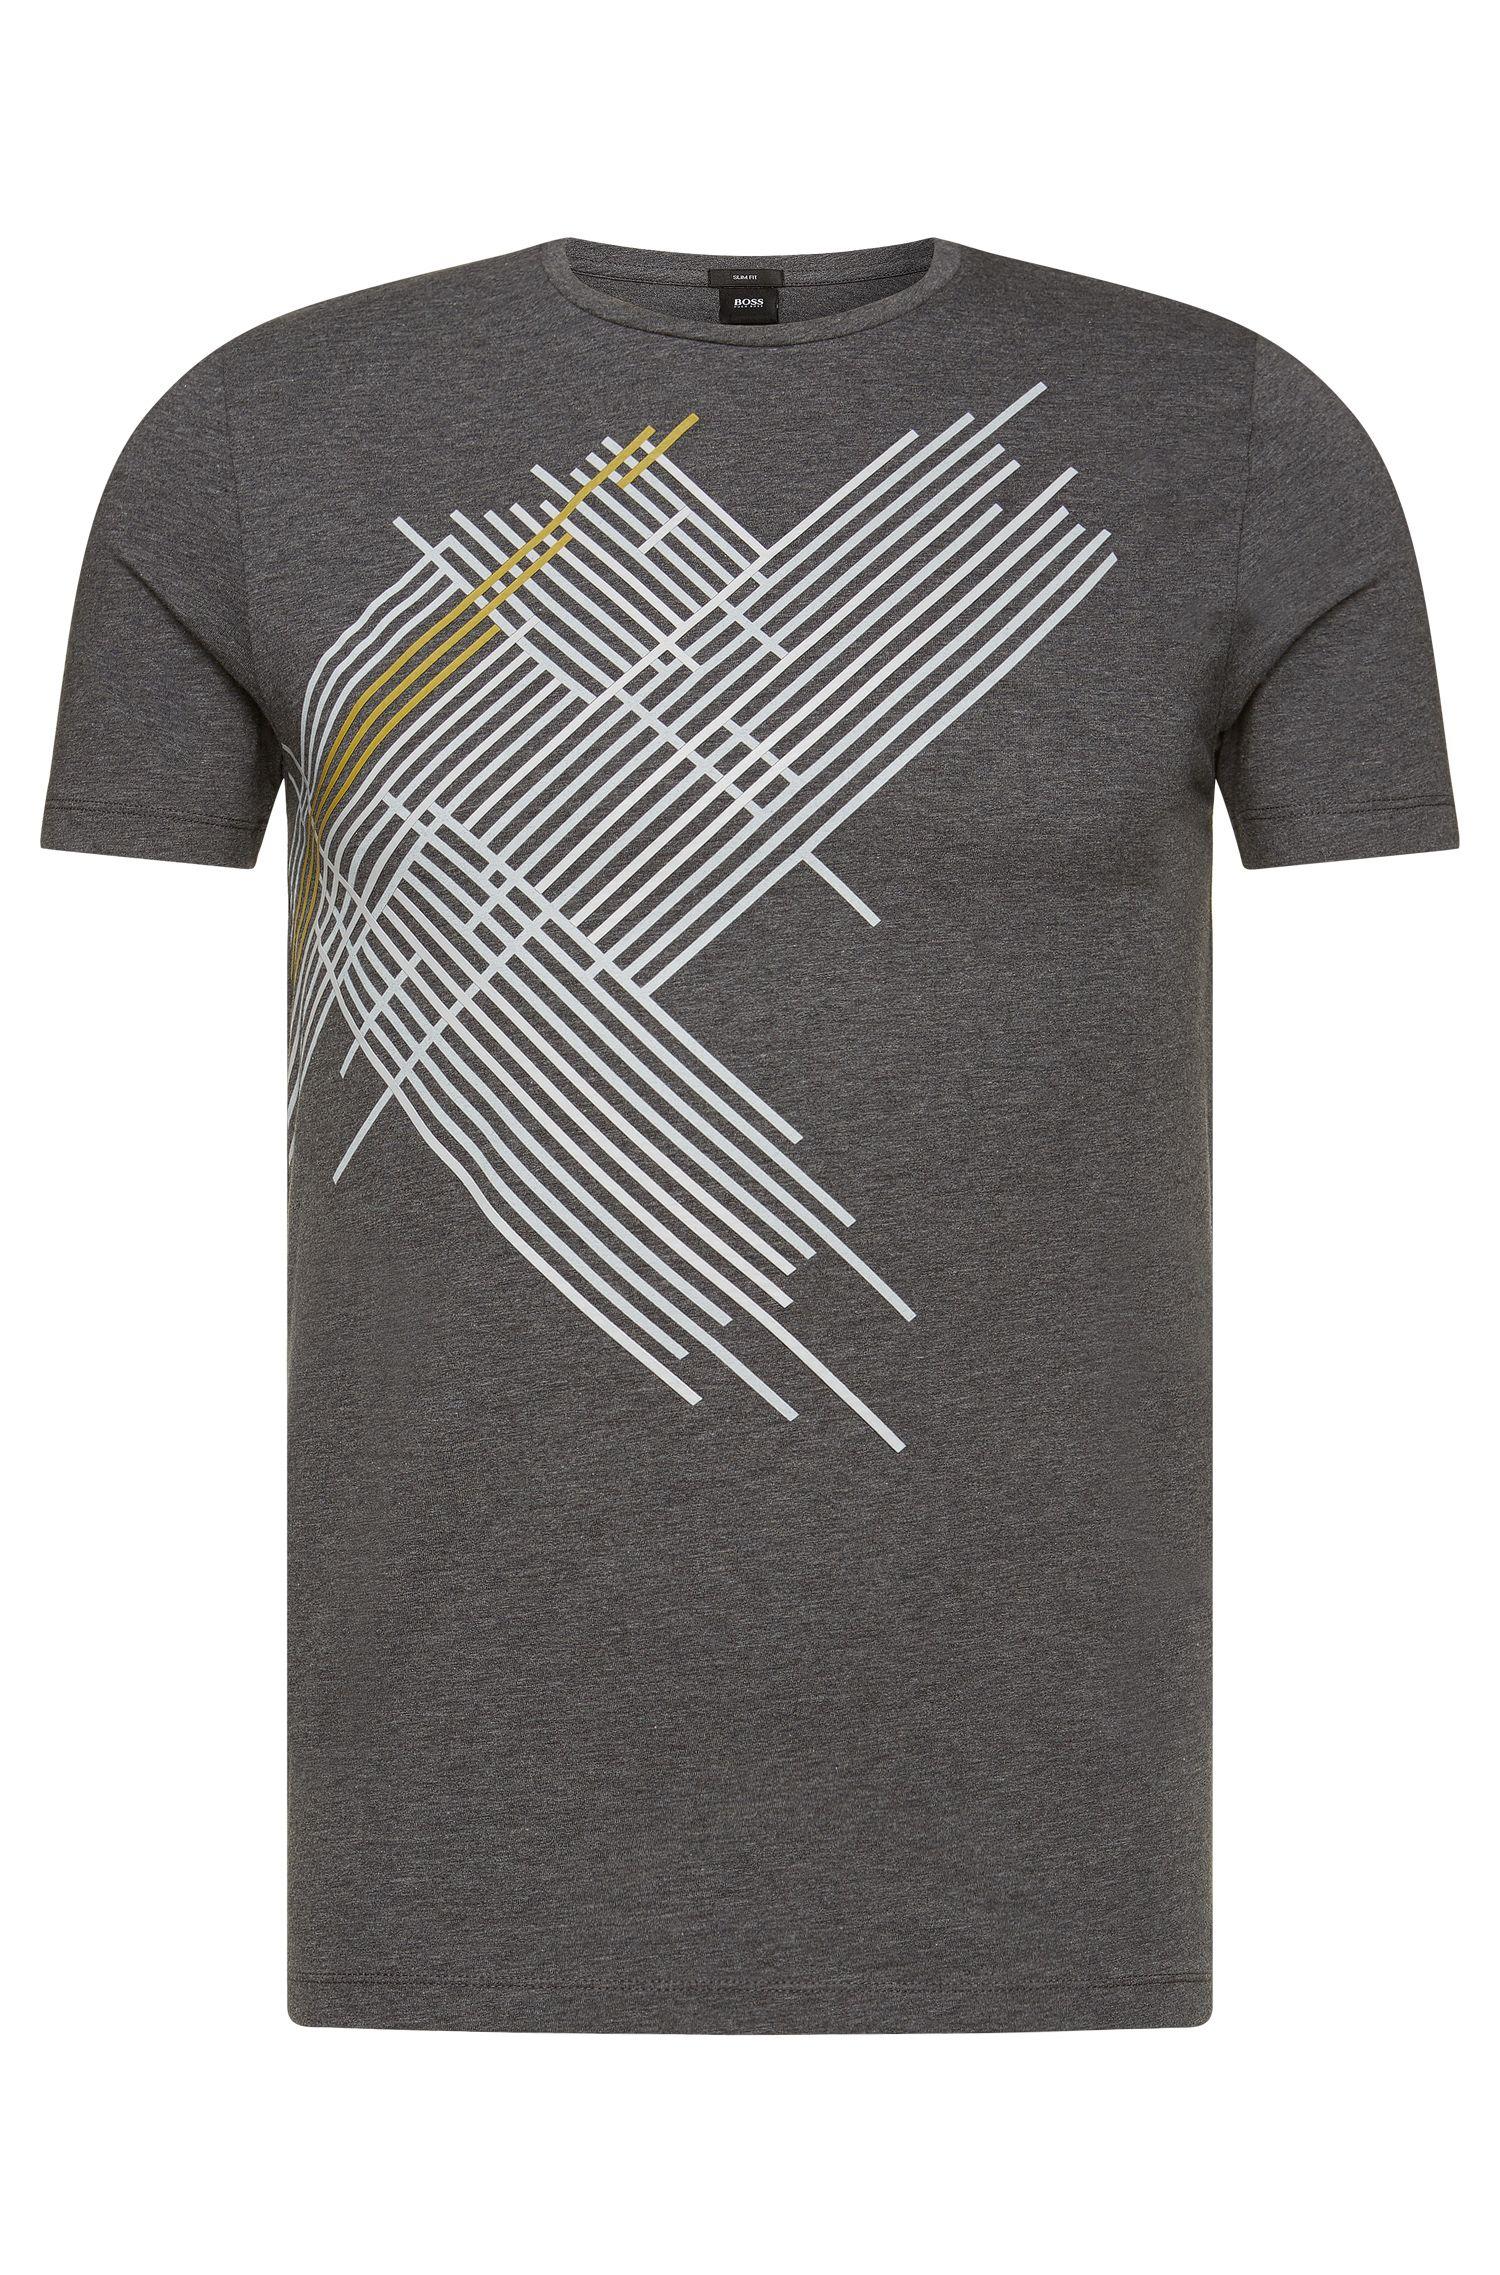 'Tessler' | Cotton Graphic Print T-Shirt